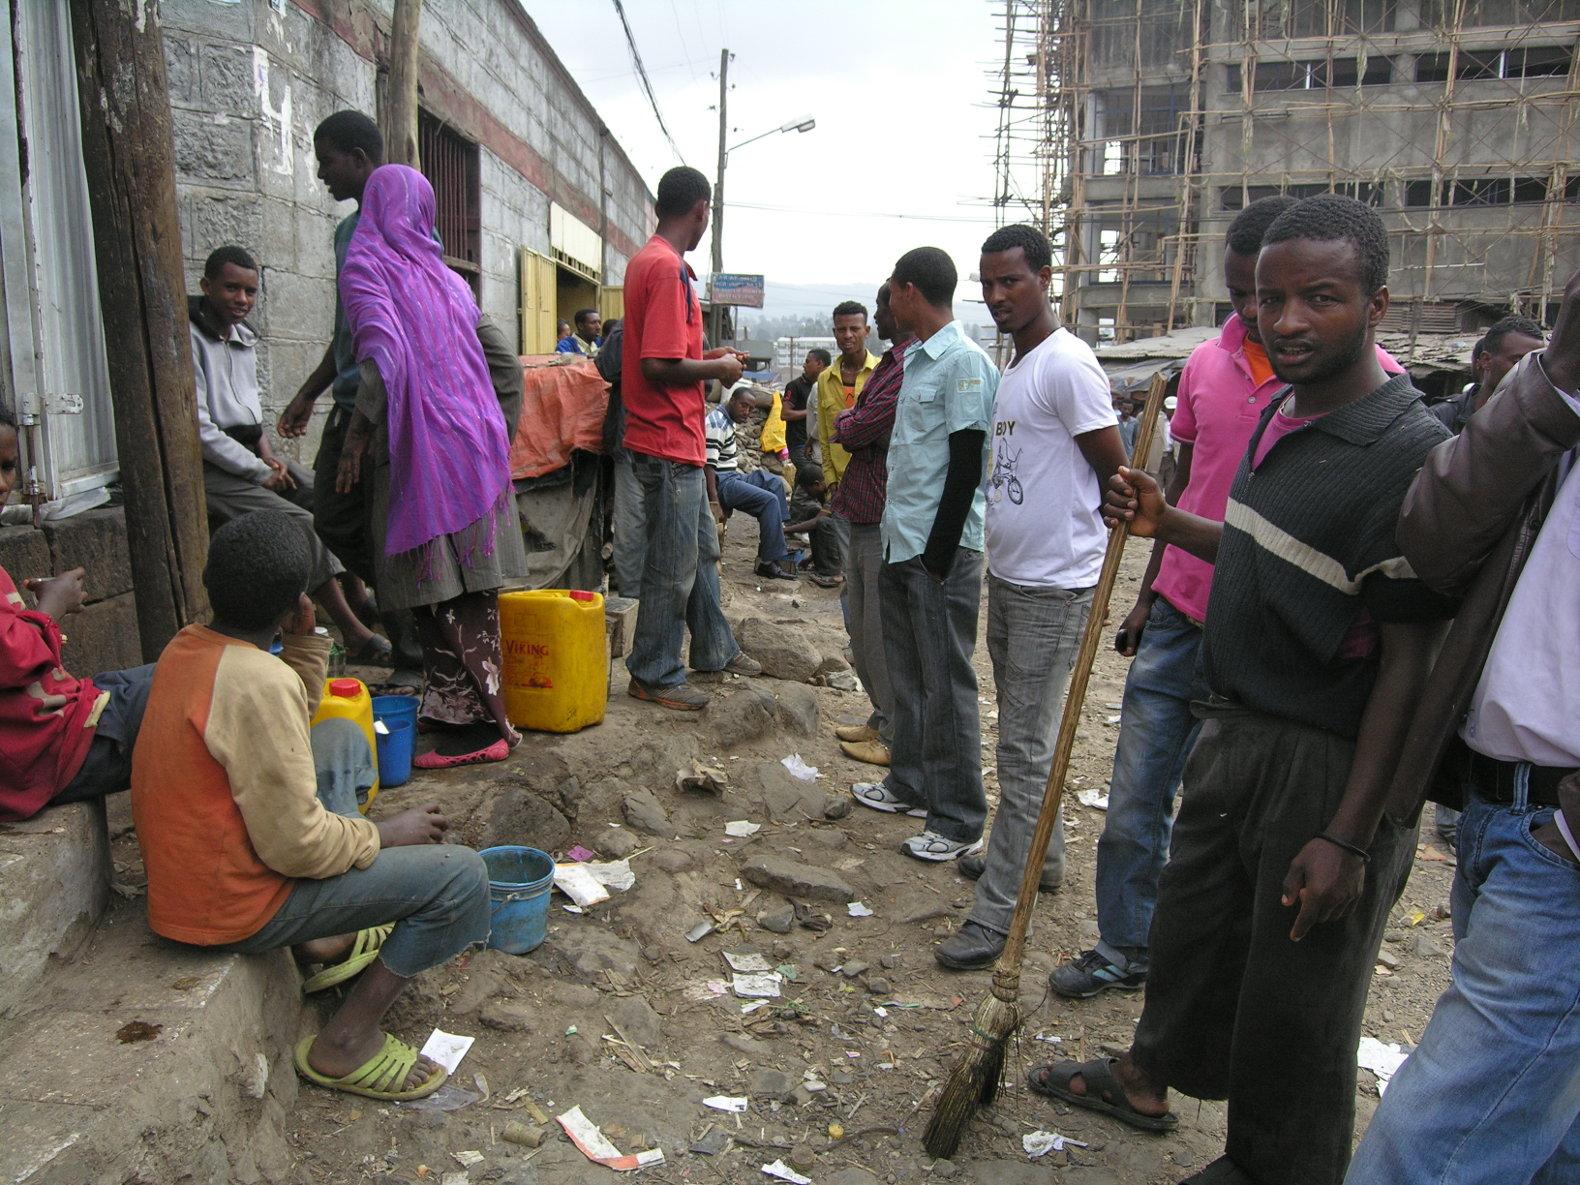 Ethiopia155 Homepage - Sport